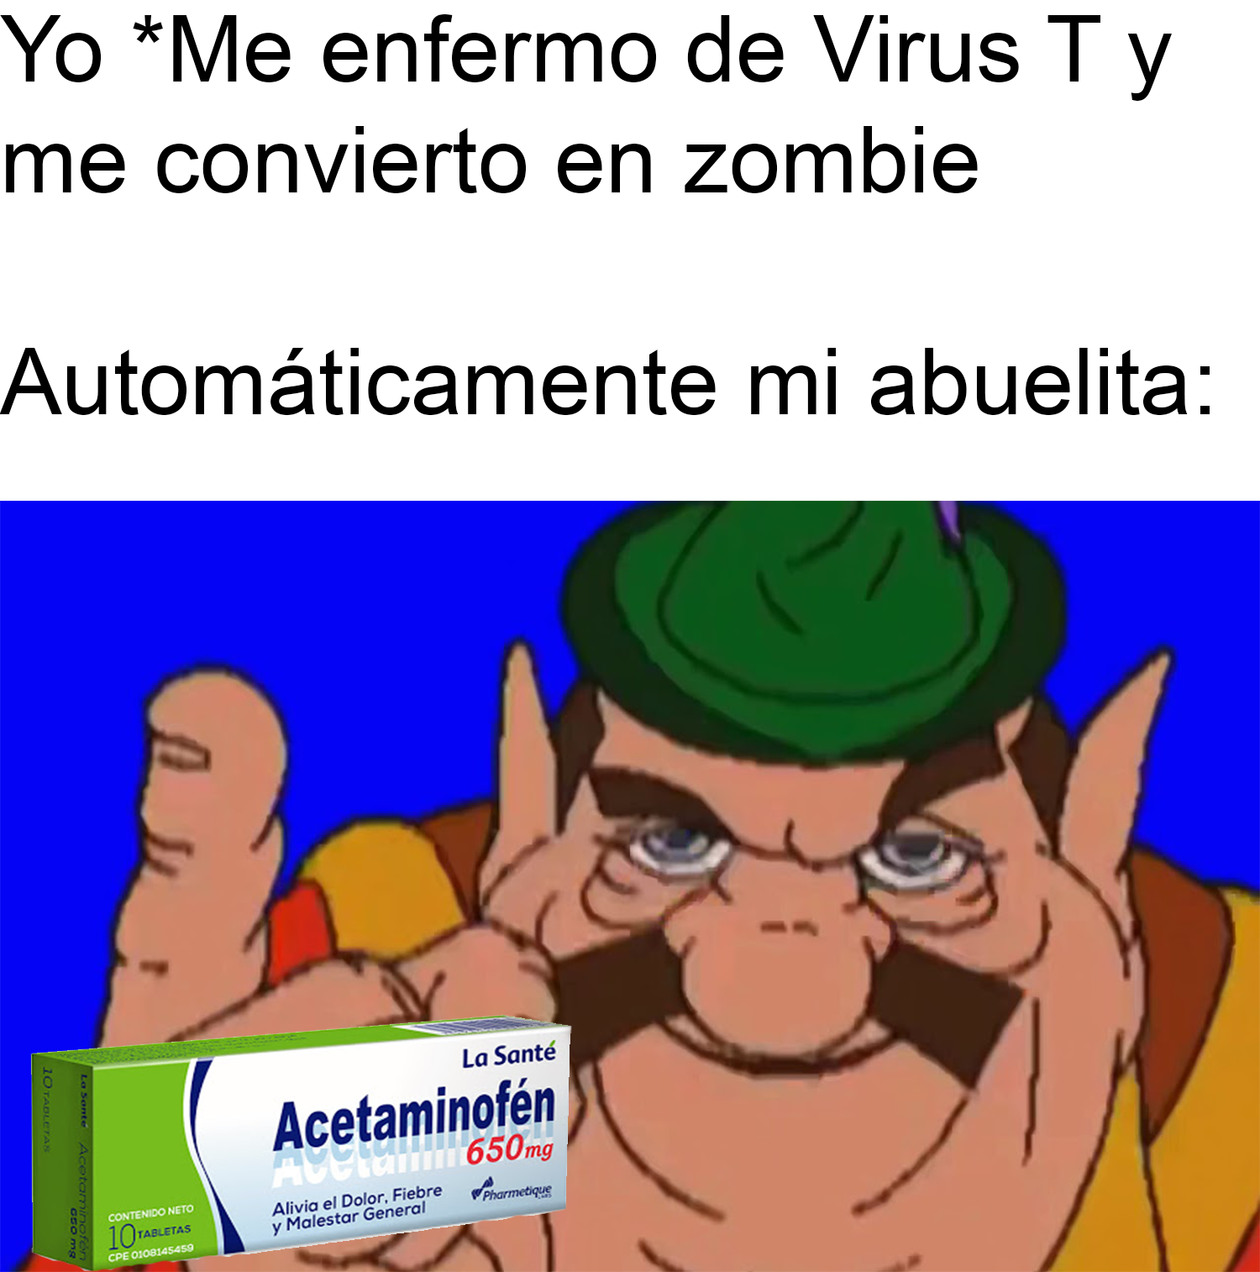 Acetaminofén - meme